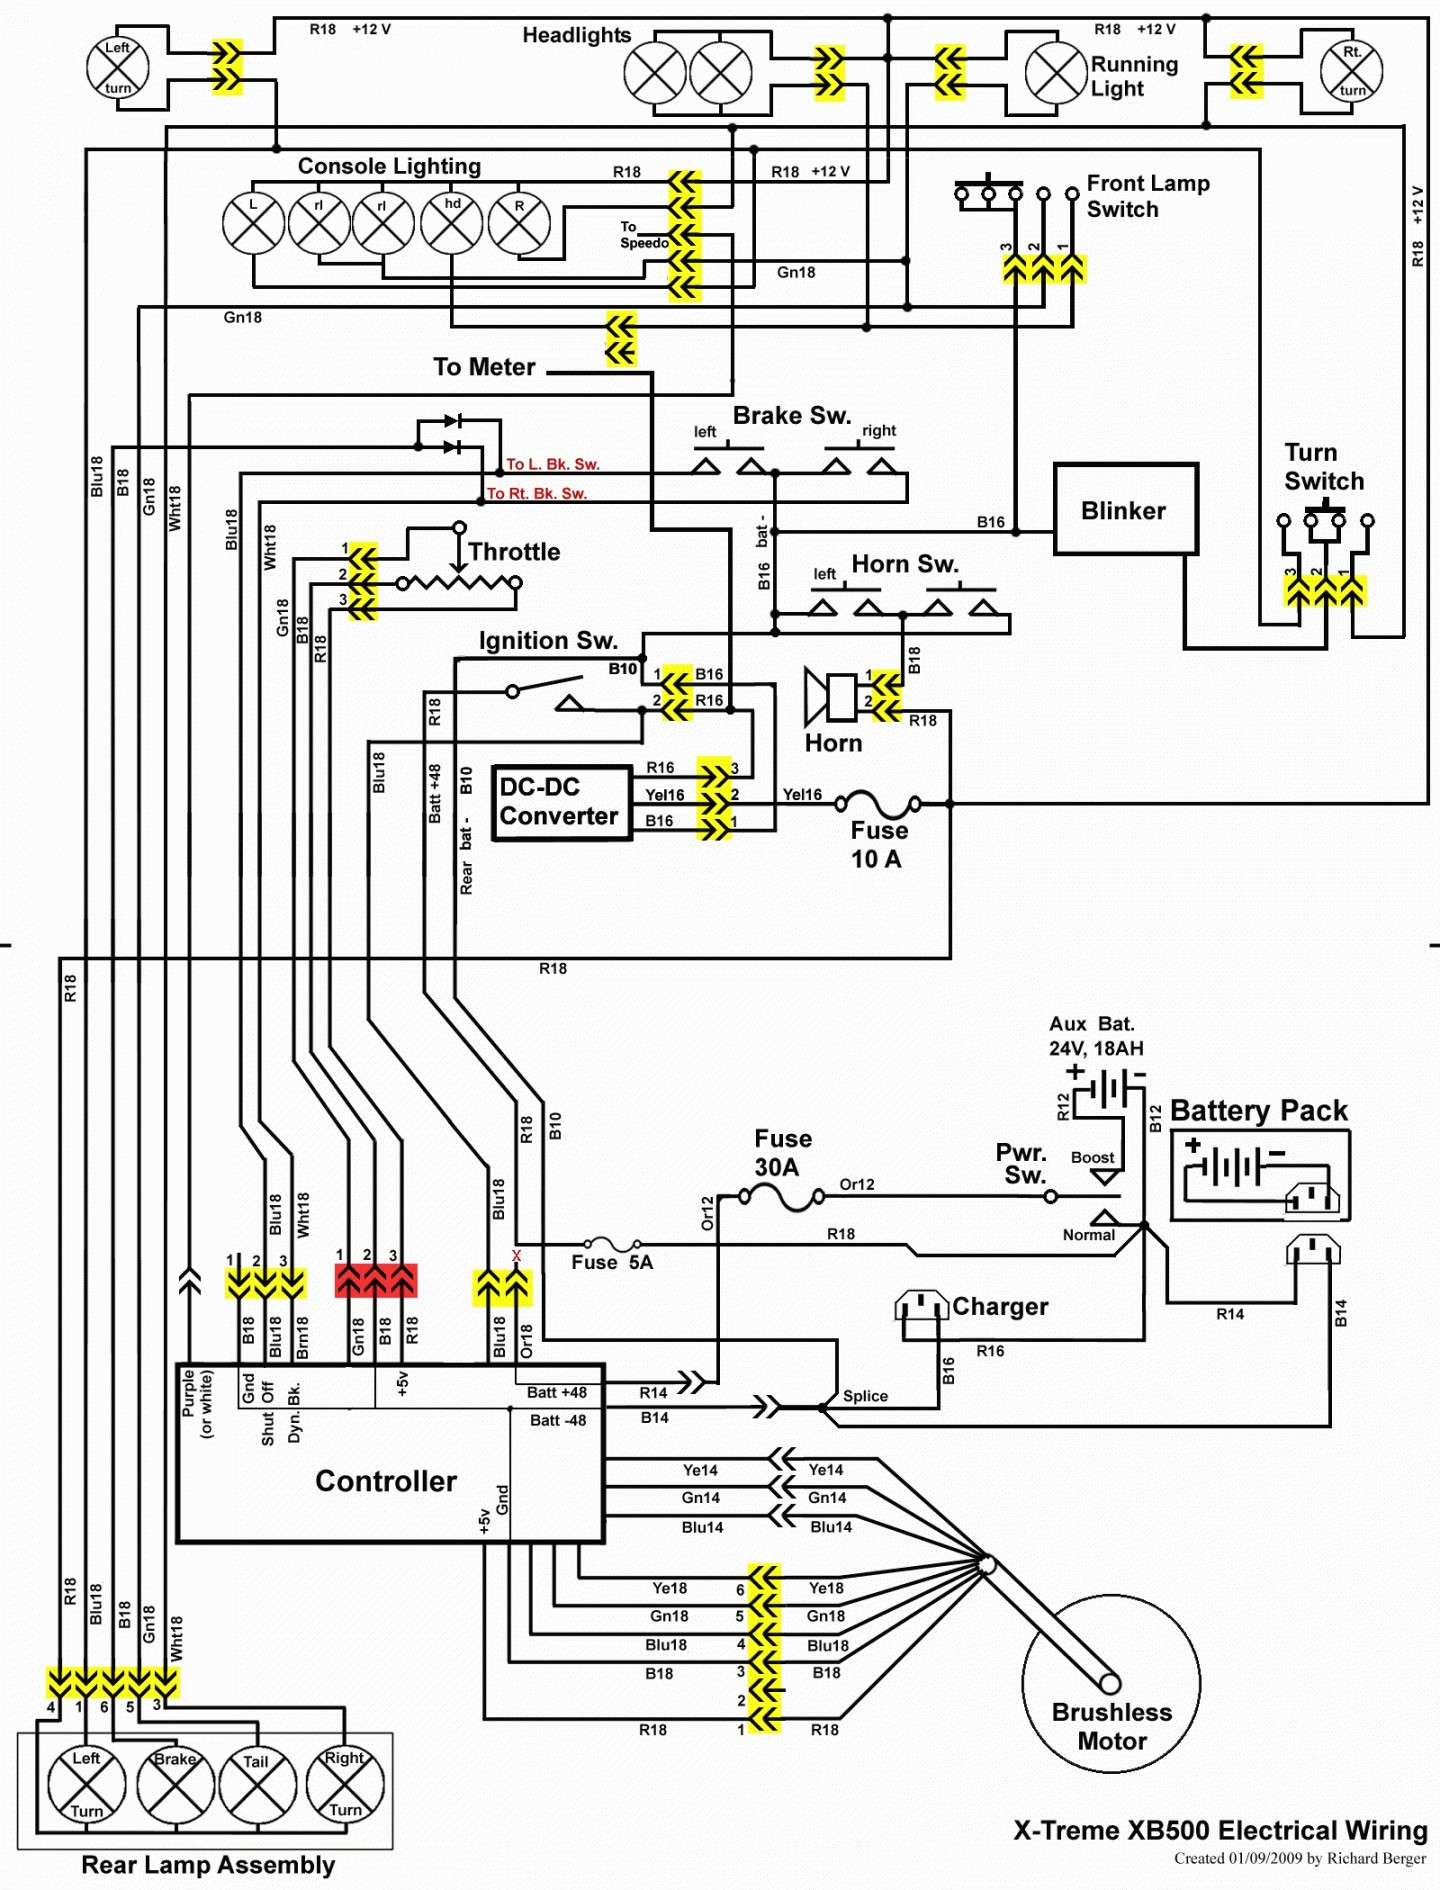 wire diagram tao tao vip wiring diagram Taotao Ata 50 Wiring Diagram taotao 50 wiring diagram wiring diagram